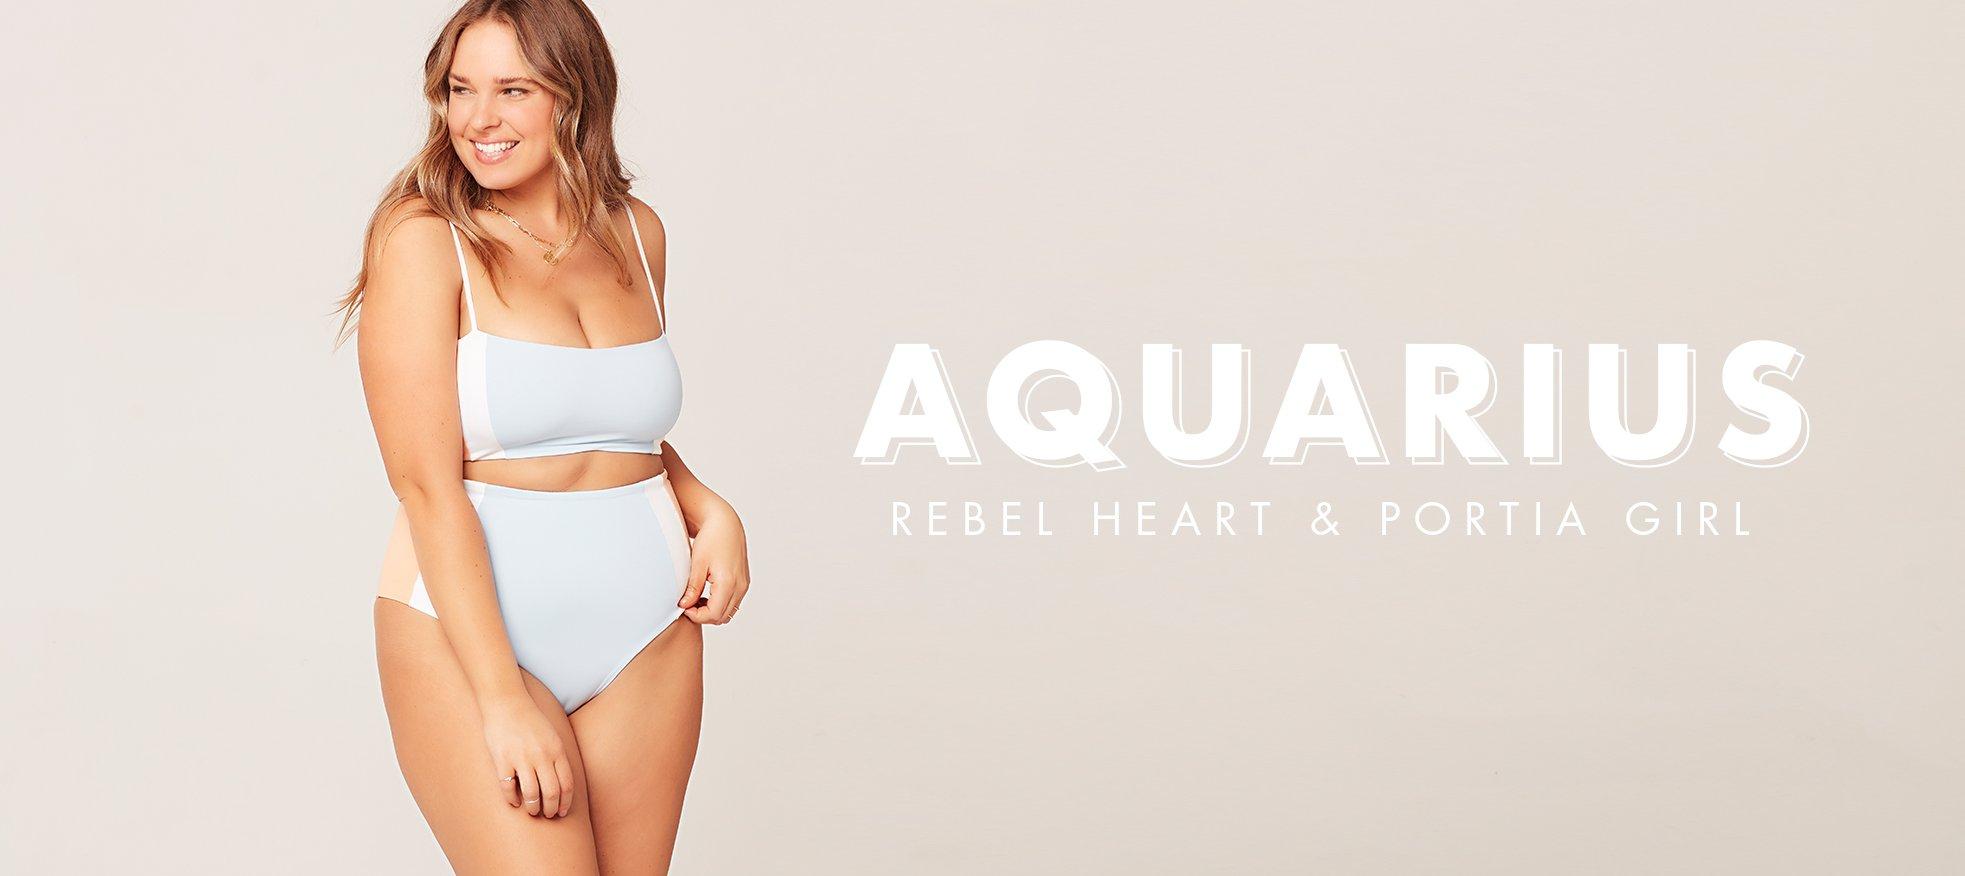 model wearing light blue rebel heart bikini top and portia girl high waist bikini bottom